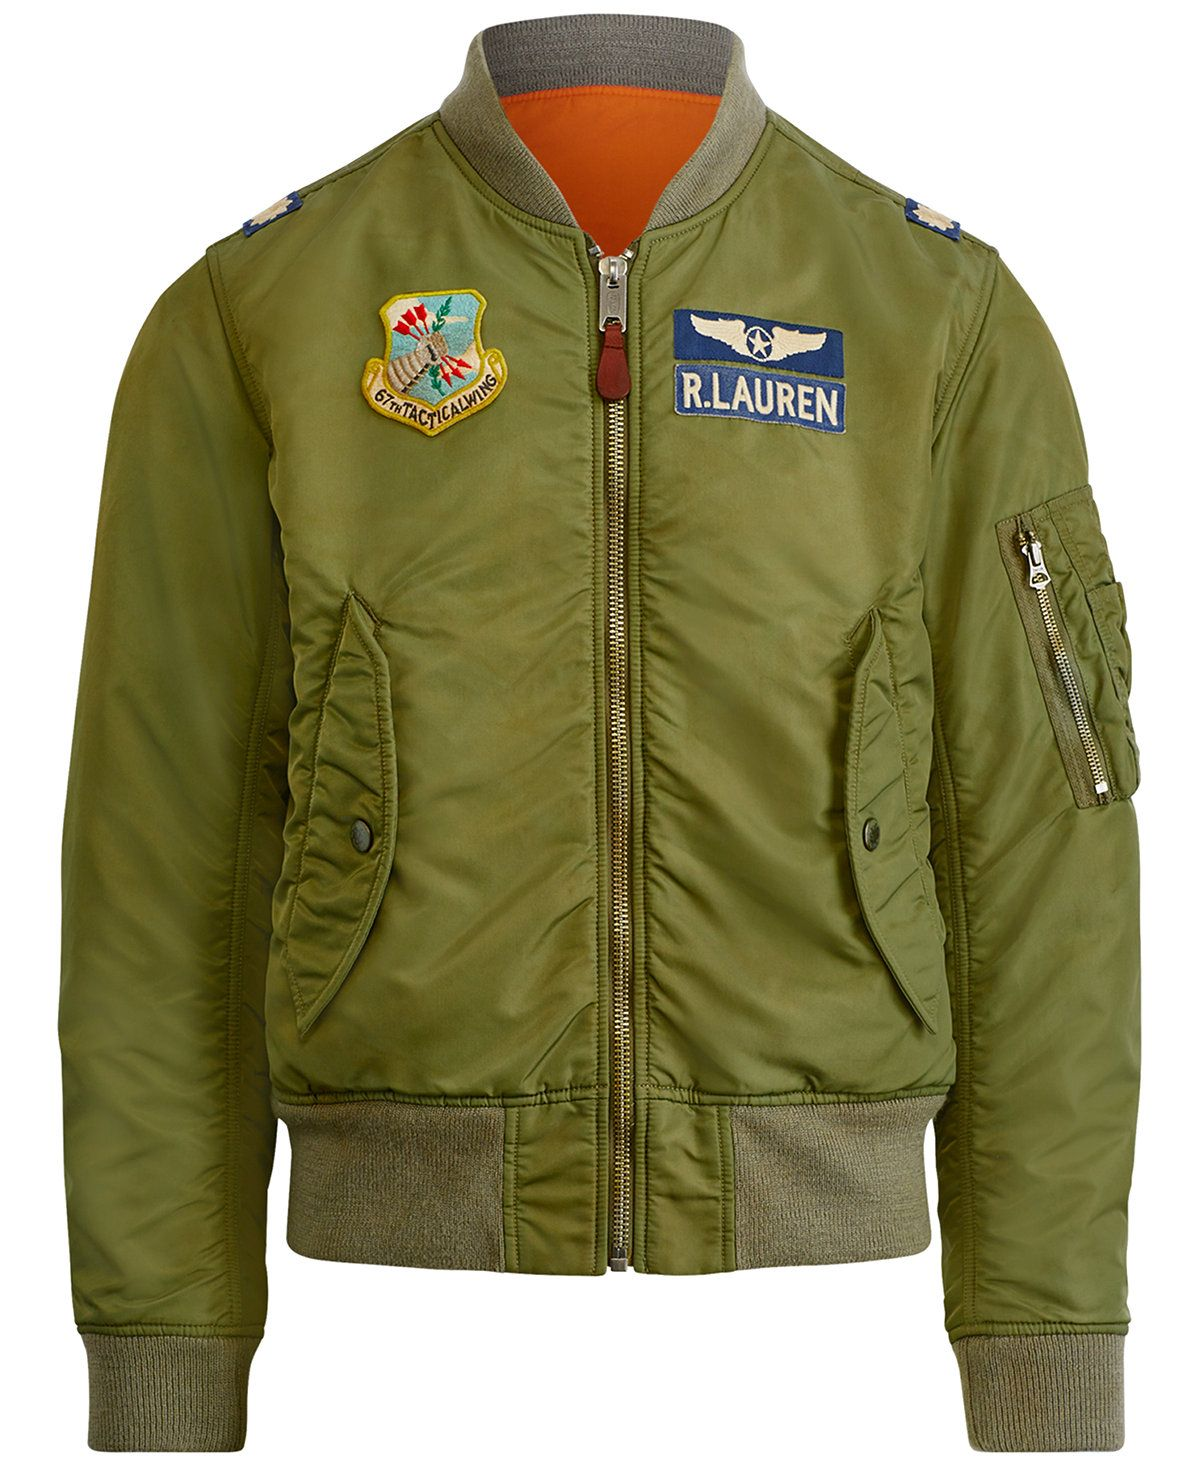 4150161c8 Polo Ralph Lauren Men's Iconic MA-1 Bomber Jacket - Coats & Jackets ...